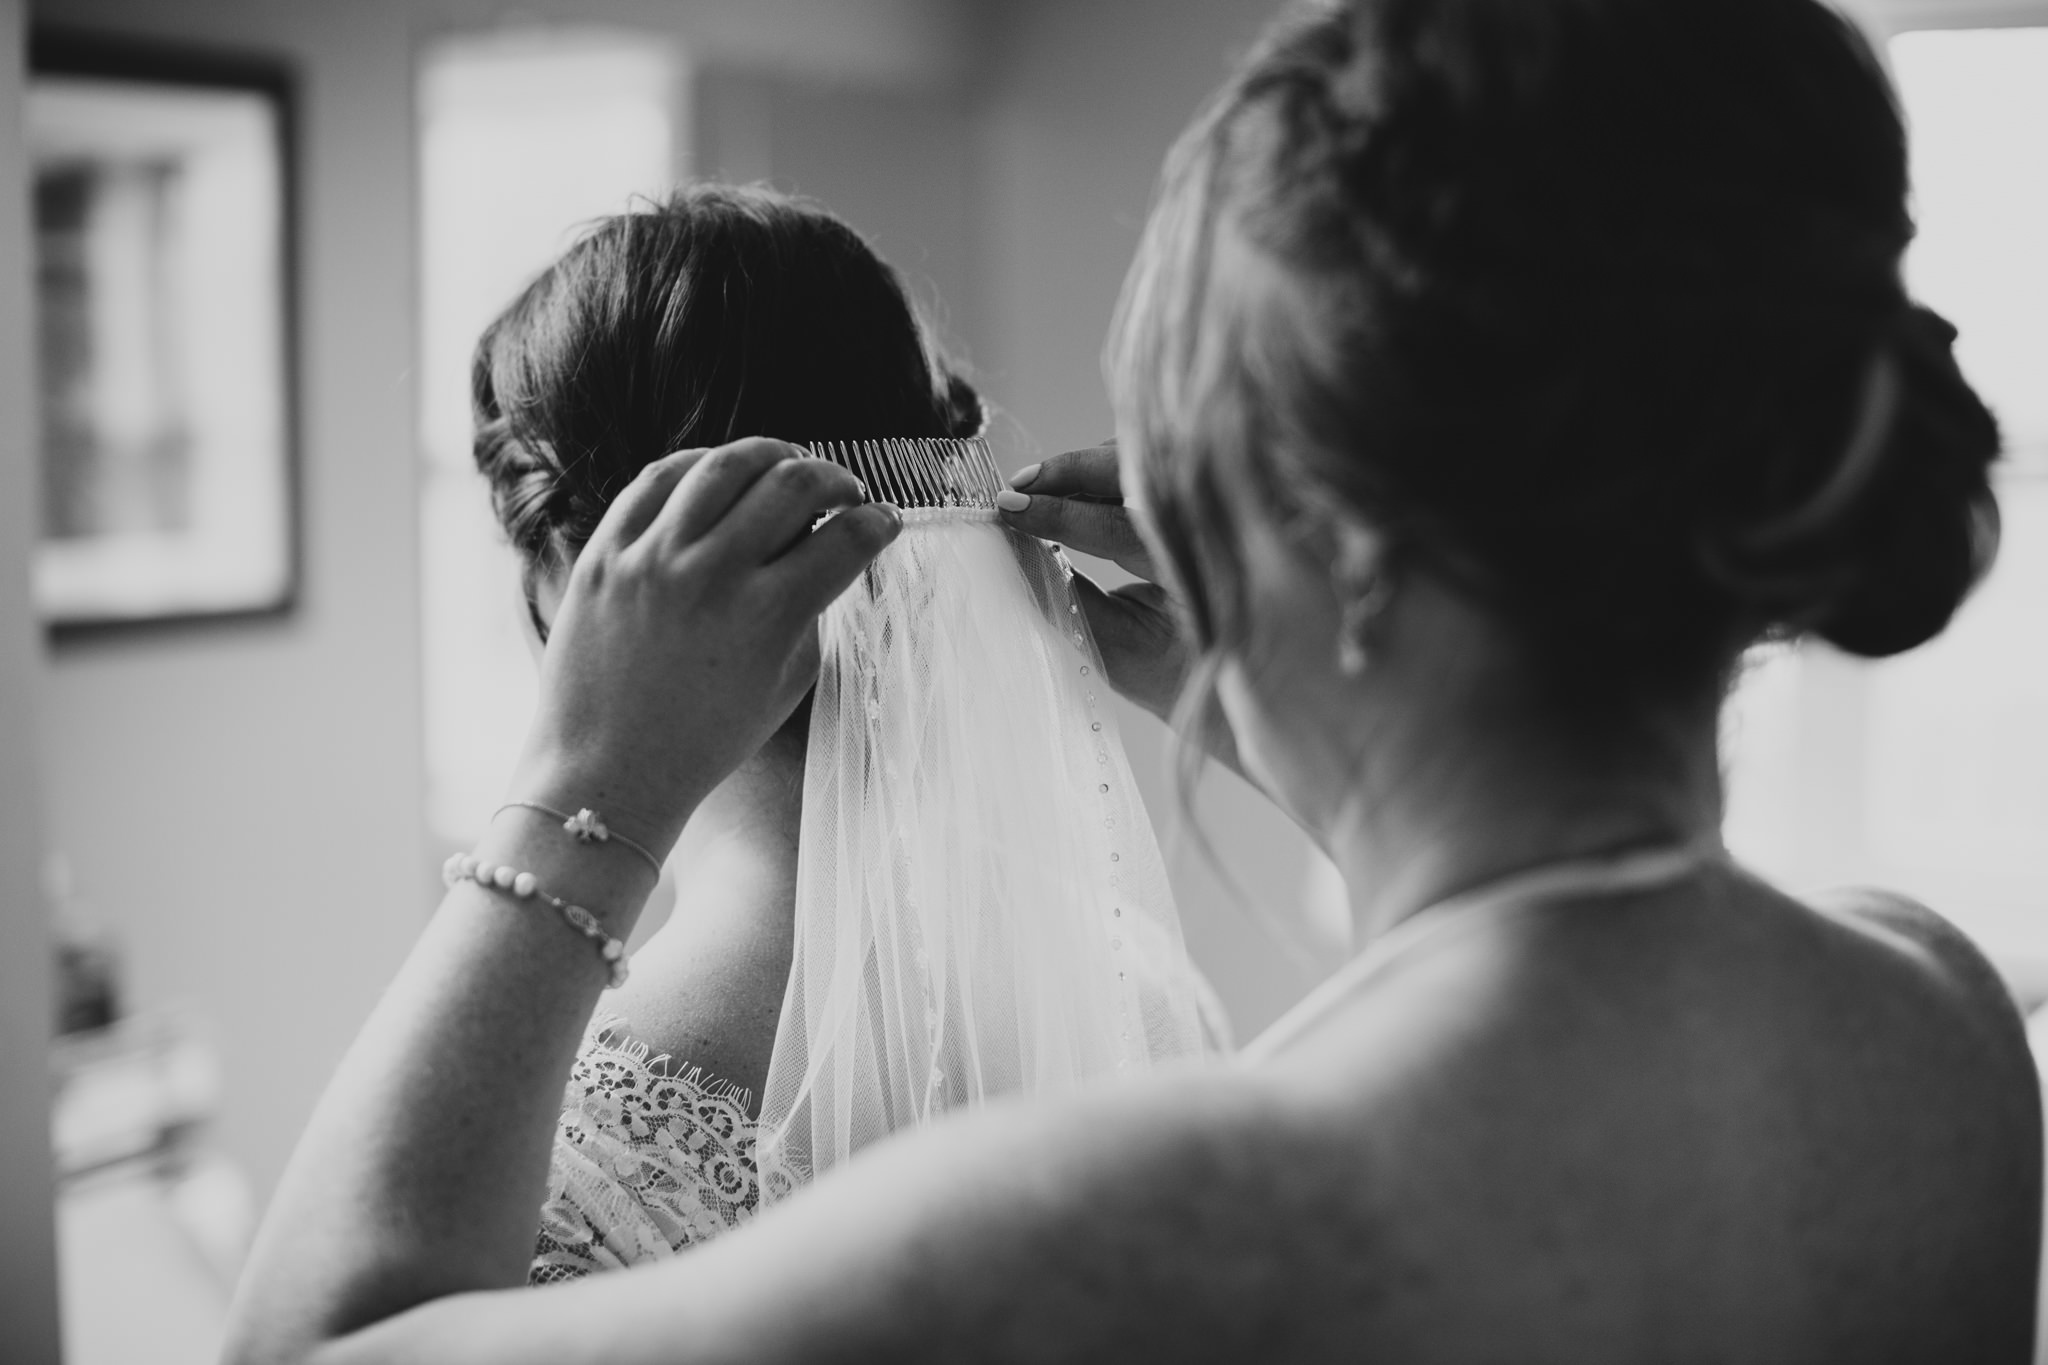 046-WEB-Jonathan-Kuhn-Photography-Stephanie-Cameron-Wedding-2364_mini.jpg